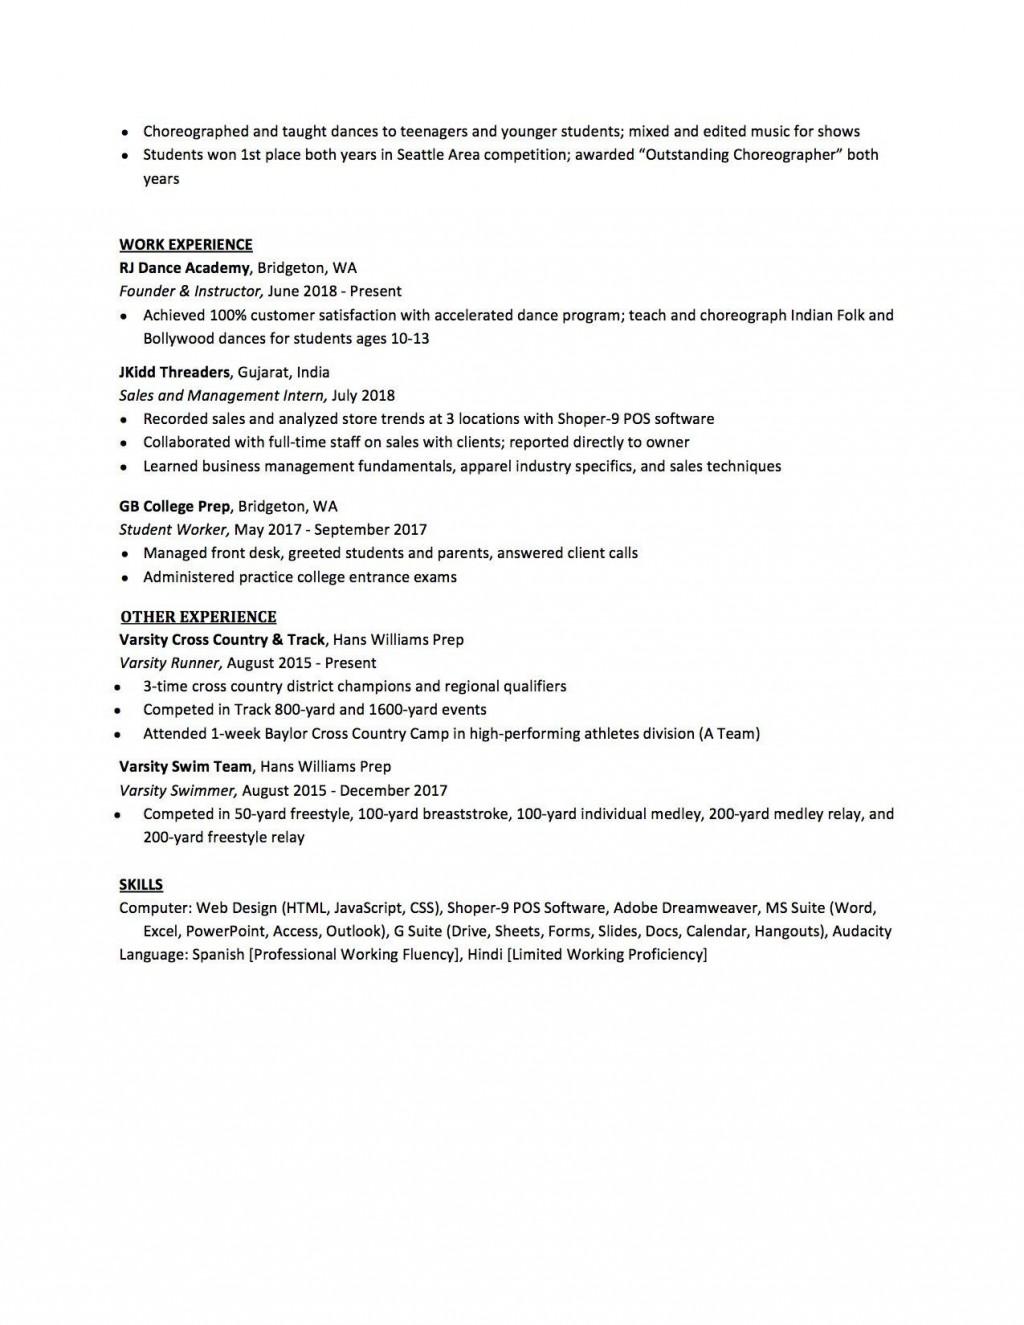 007 Sensational High School Student Resume Template Design  Free Microsoft Word 2010Large